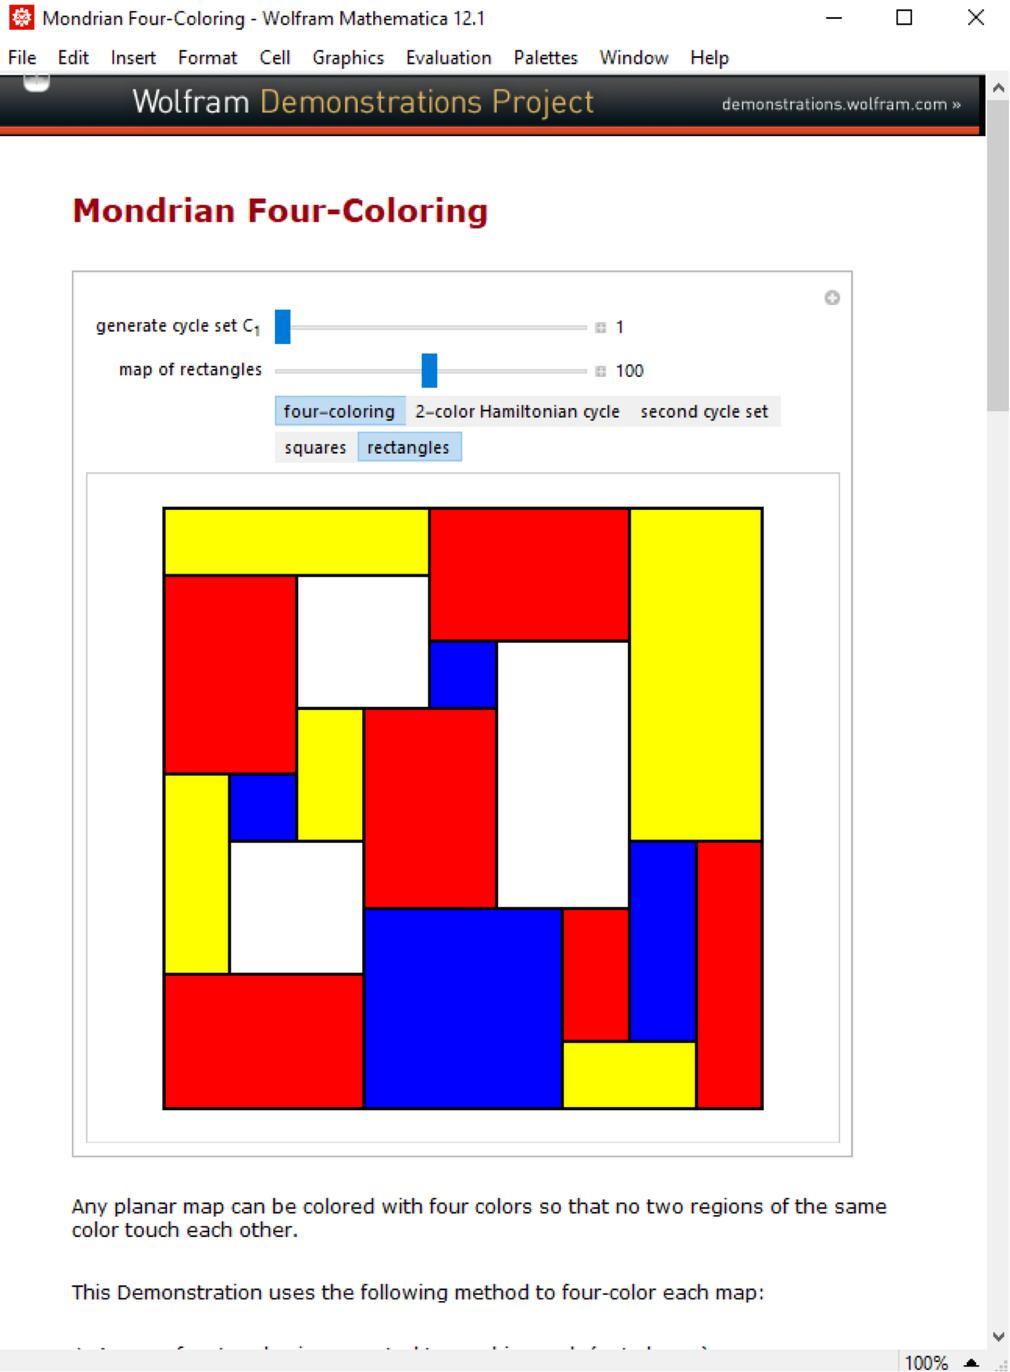 Mondrian Four-Coloring